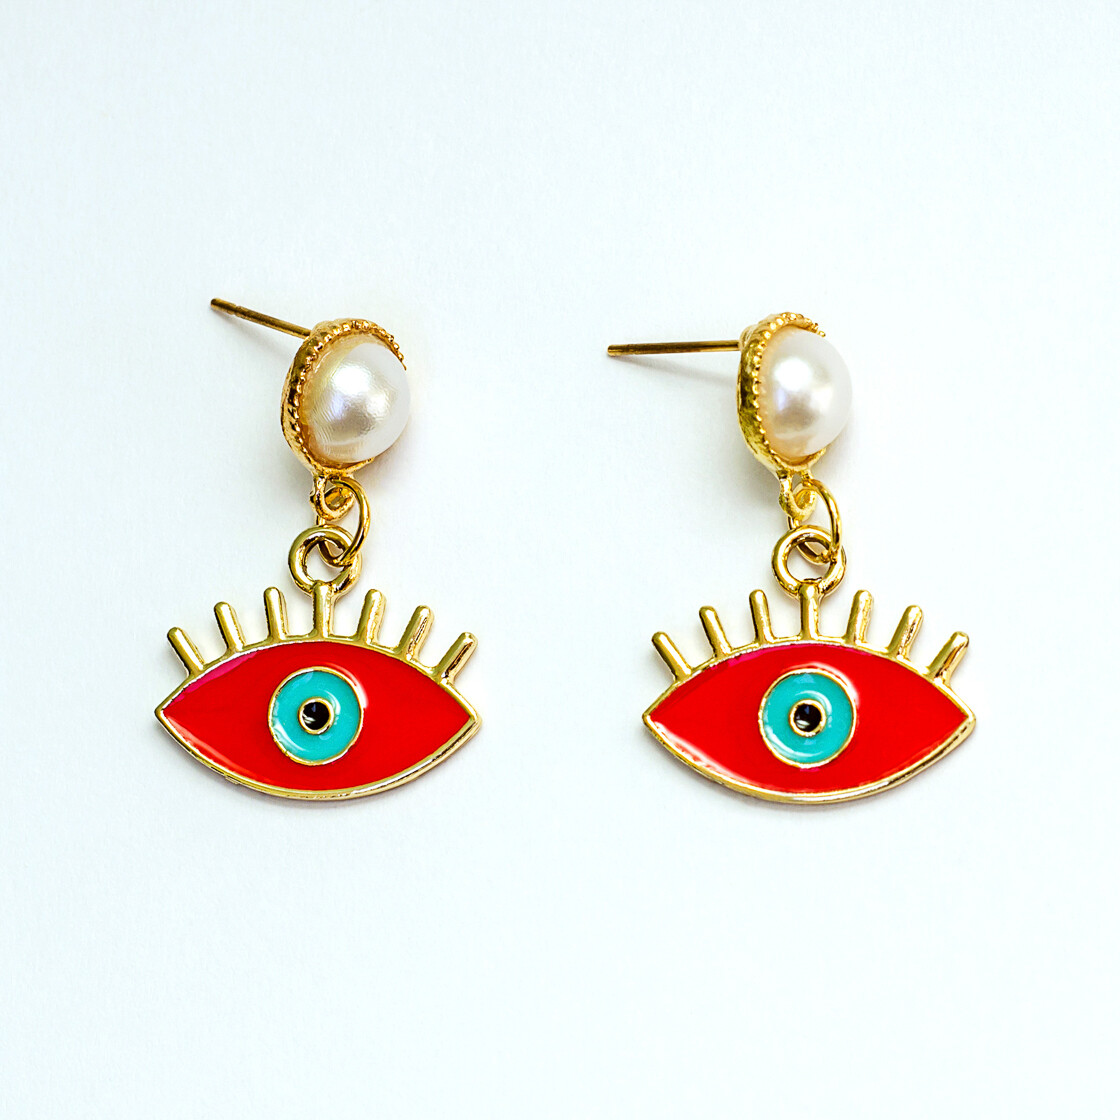 Red Eye Earrings - BLACKDOLL ACCESSORIES